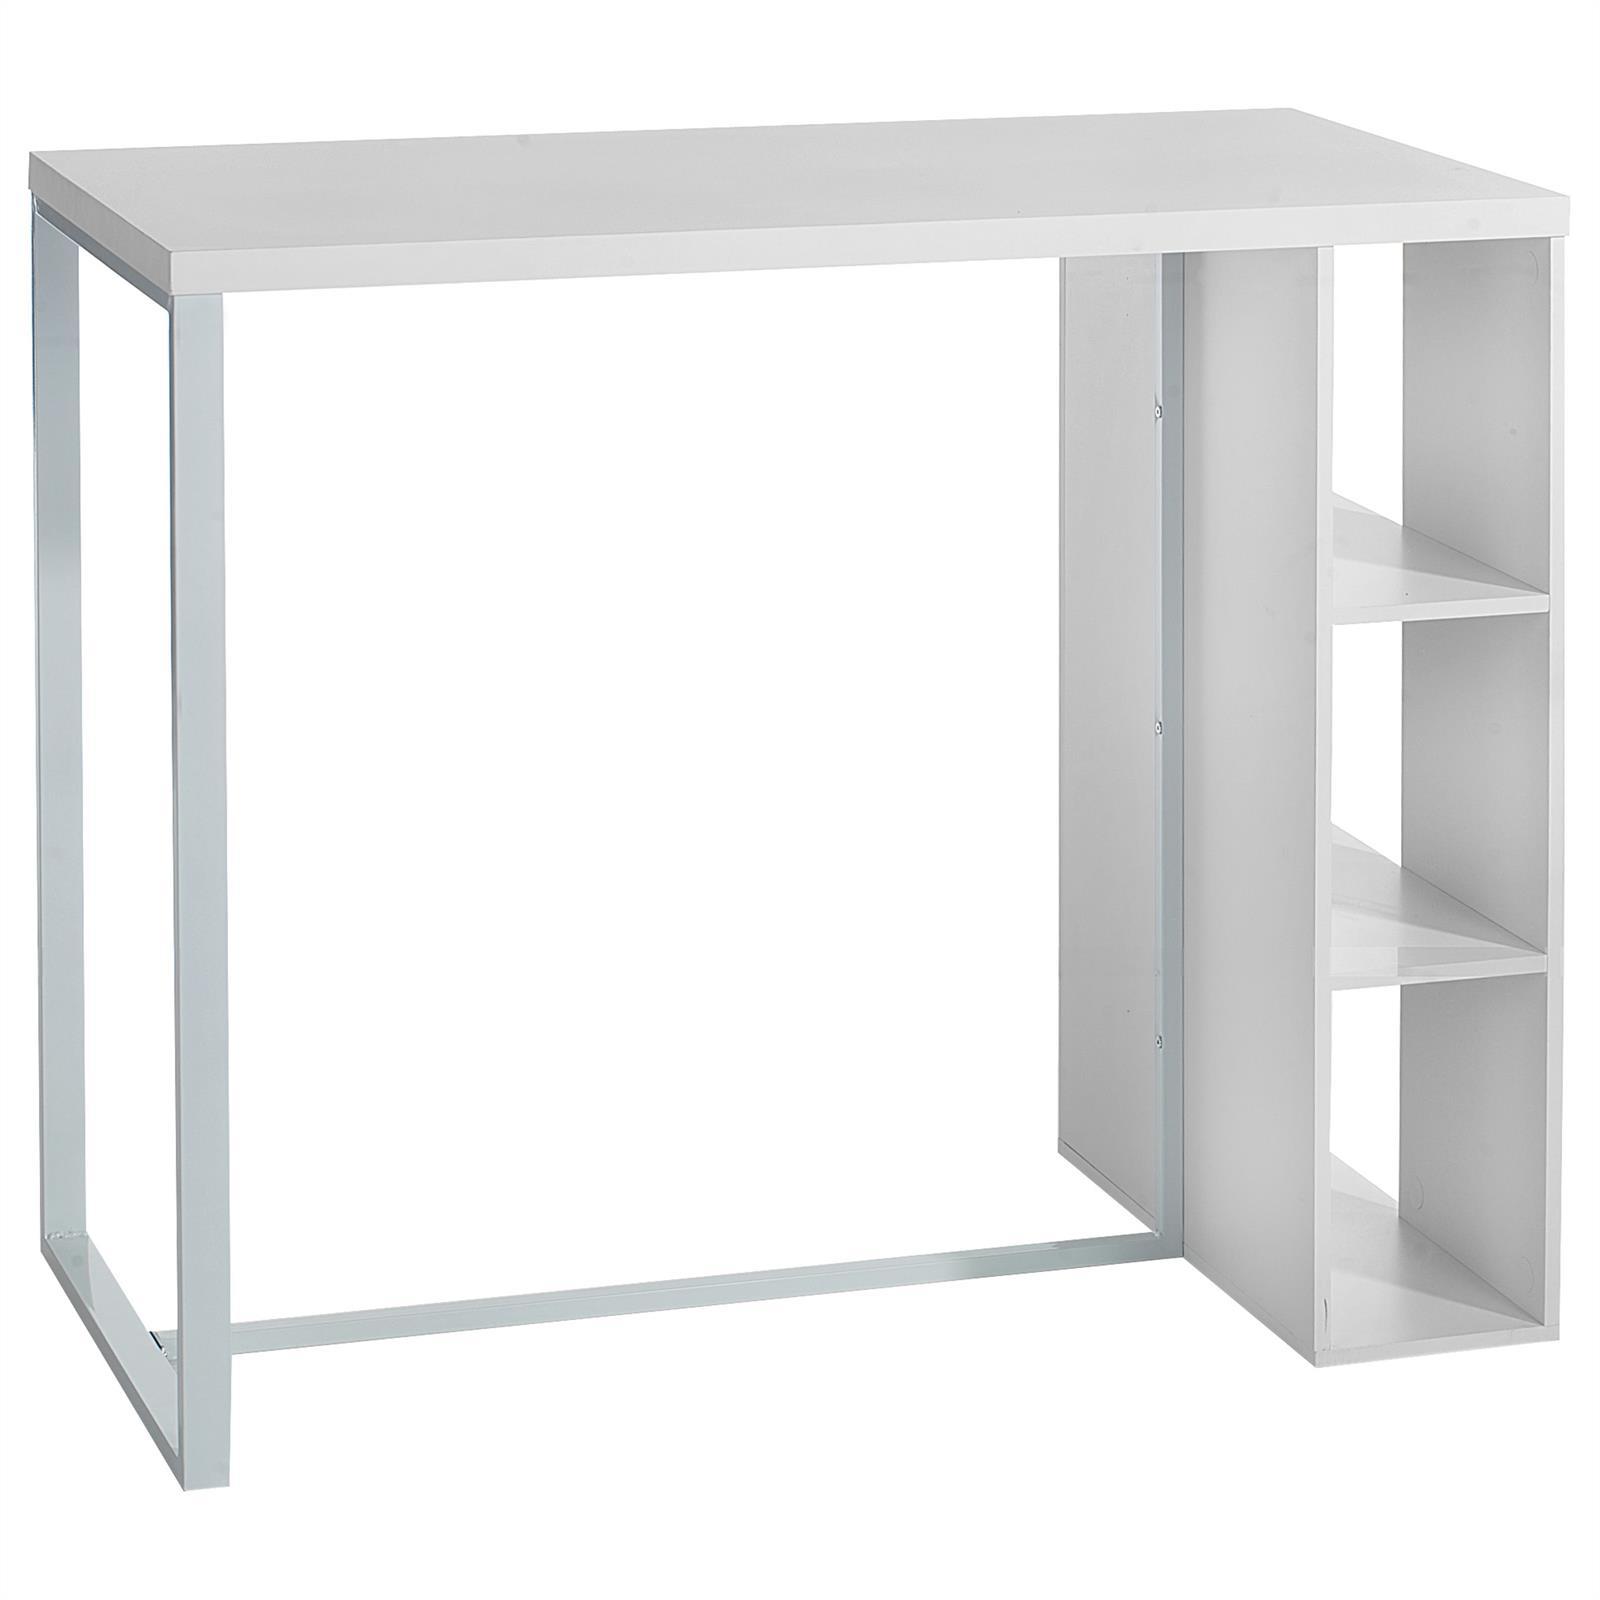 bartisch bartresen ibiza in wei mobilia24. Black Bedroom Furniture Sets. Home Design Ideas